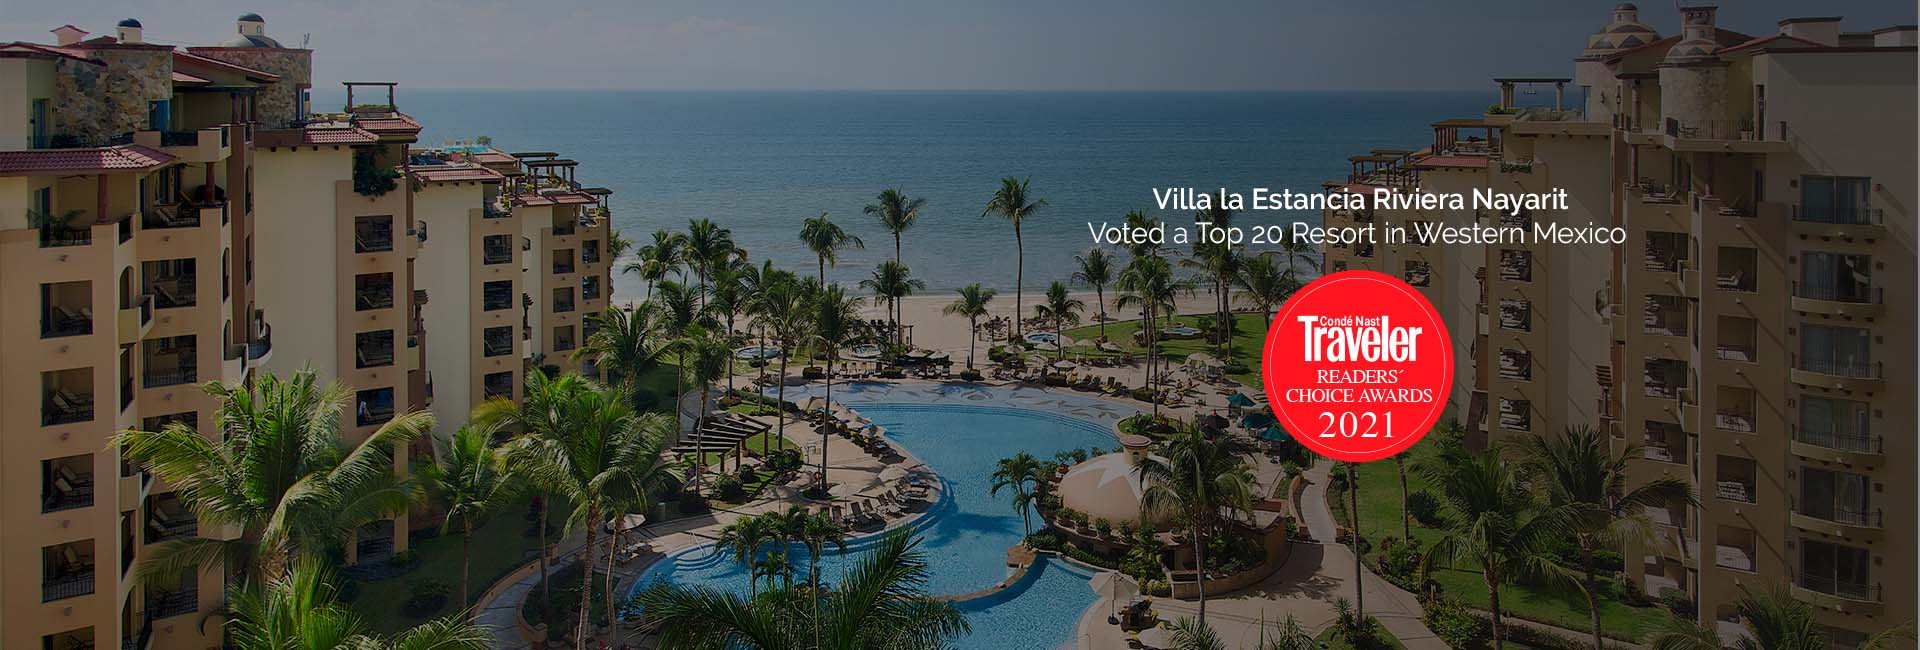 Villa la estancia one of the best resorts by conde nast readers choice awards 2021